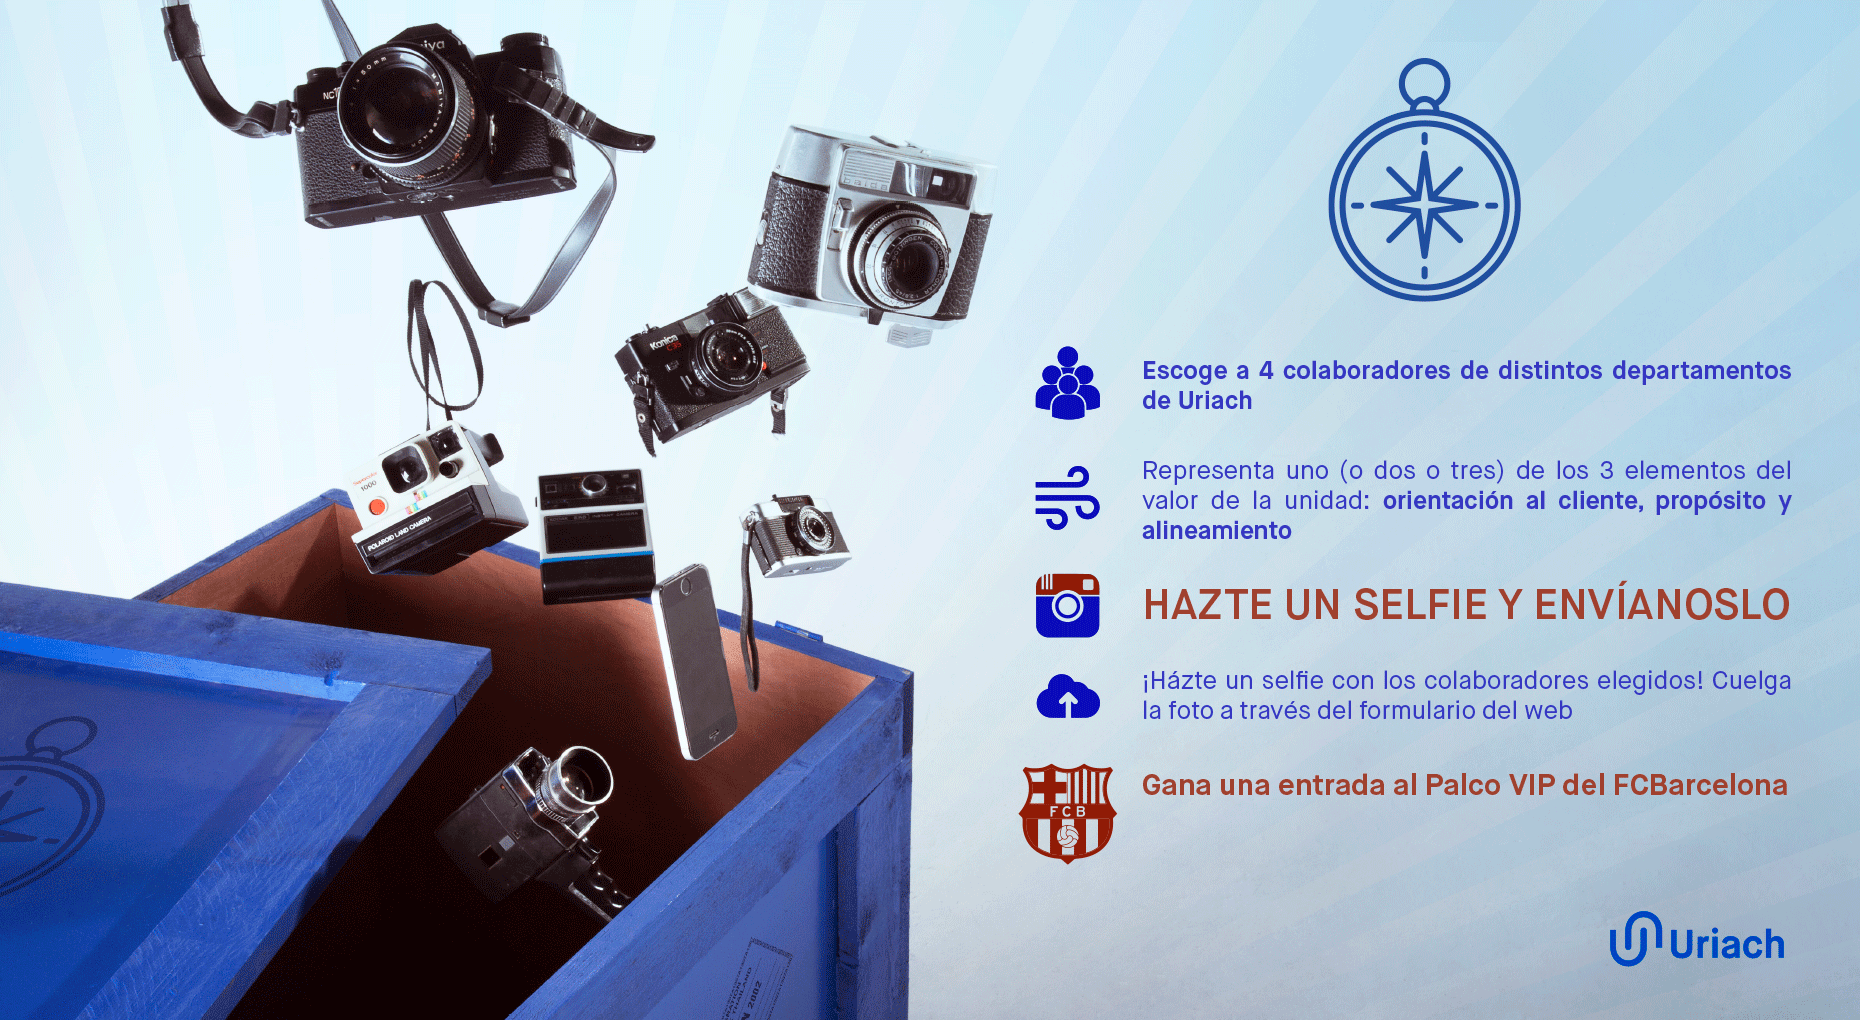 Campaña_Uriach_Hazte_un_selfie_CajaViajera